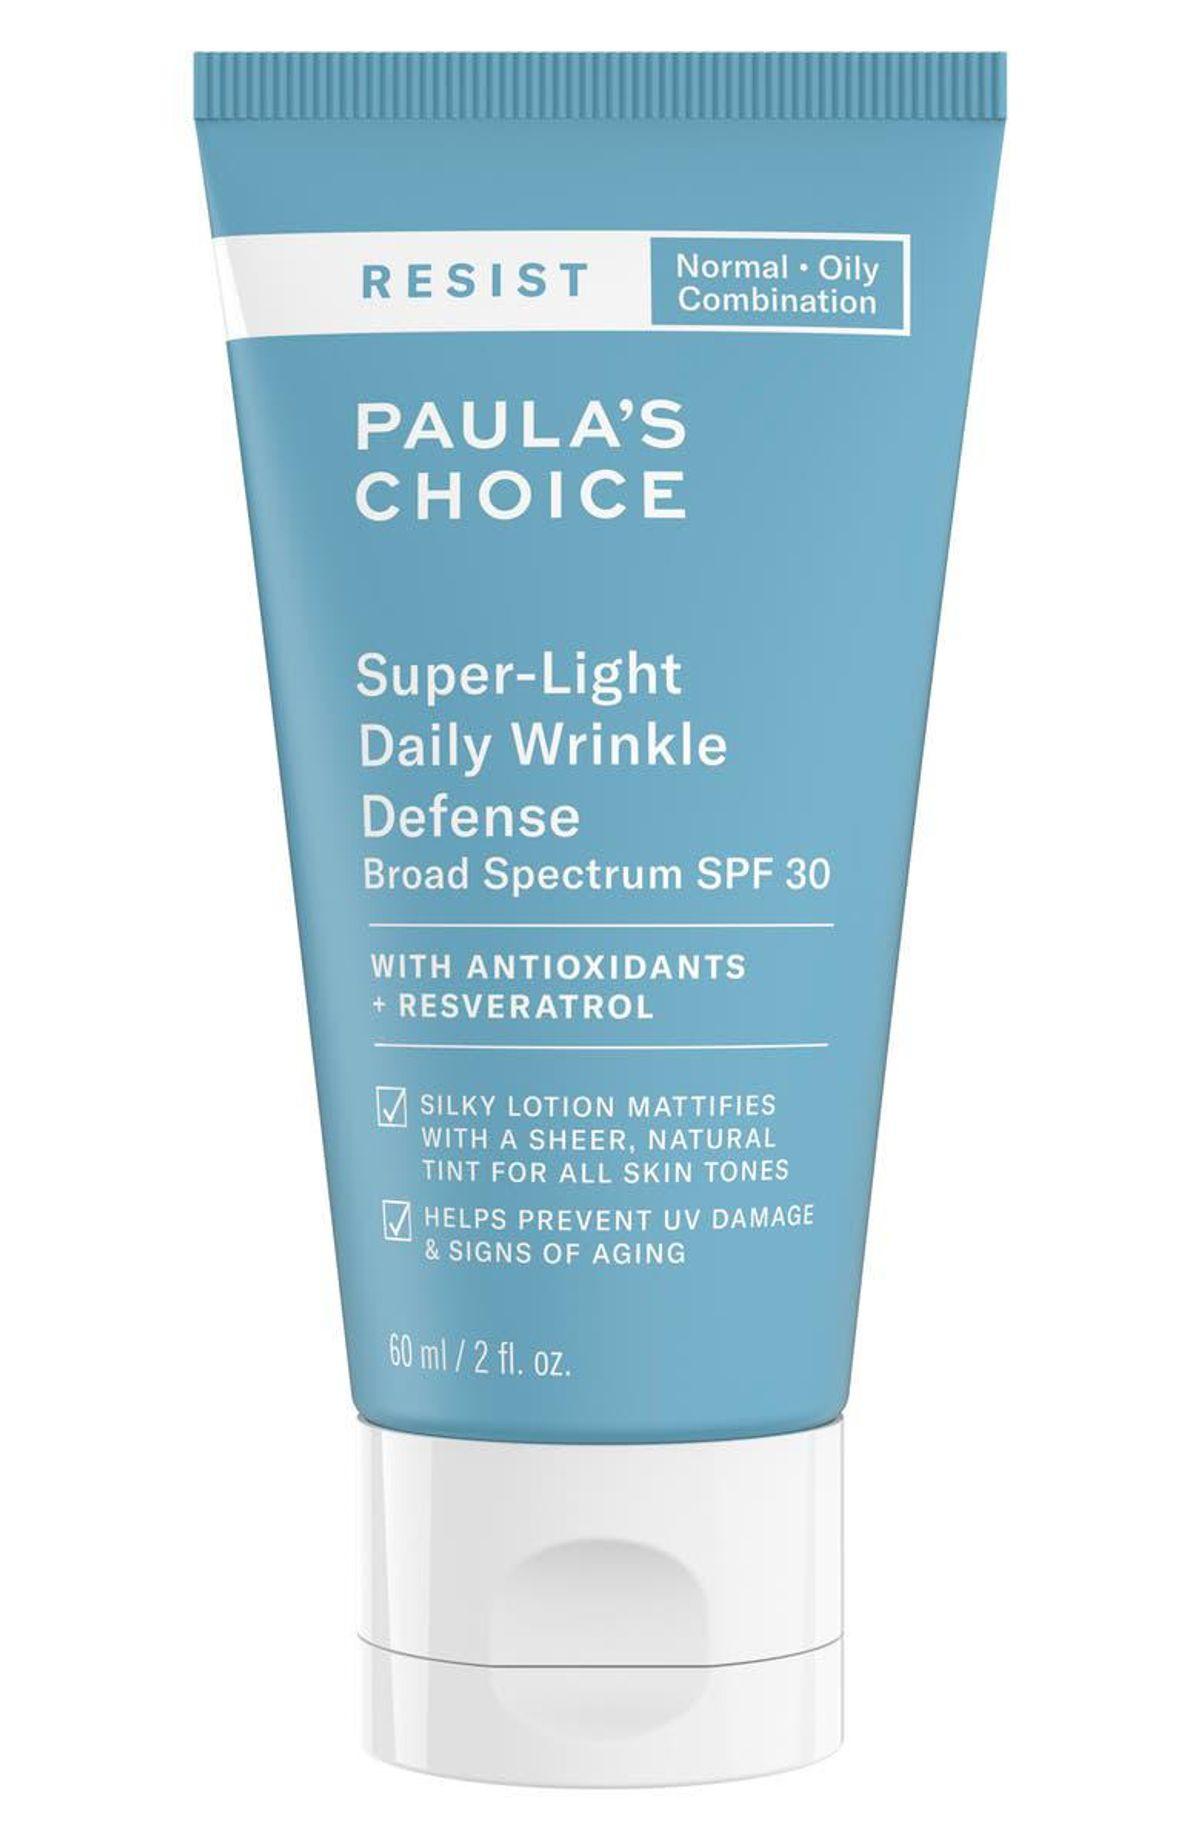 Resist Super-Light Daily Wrinkle Defense SPF 30